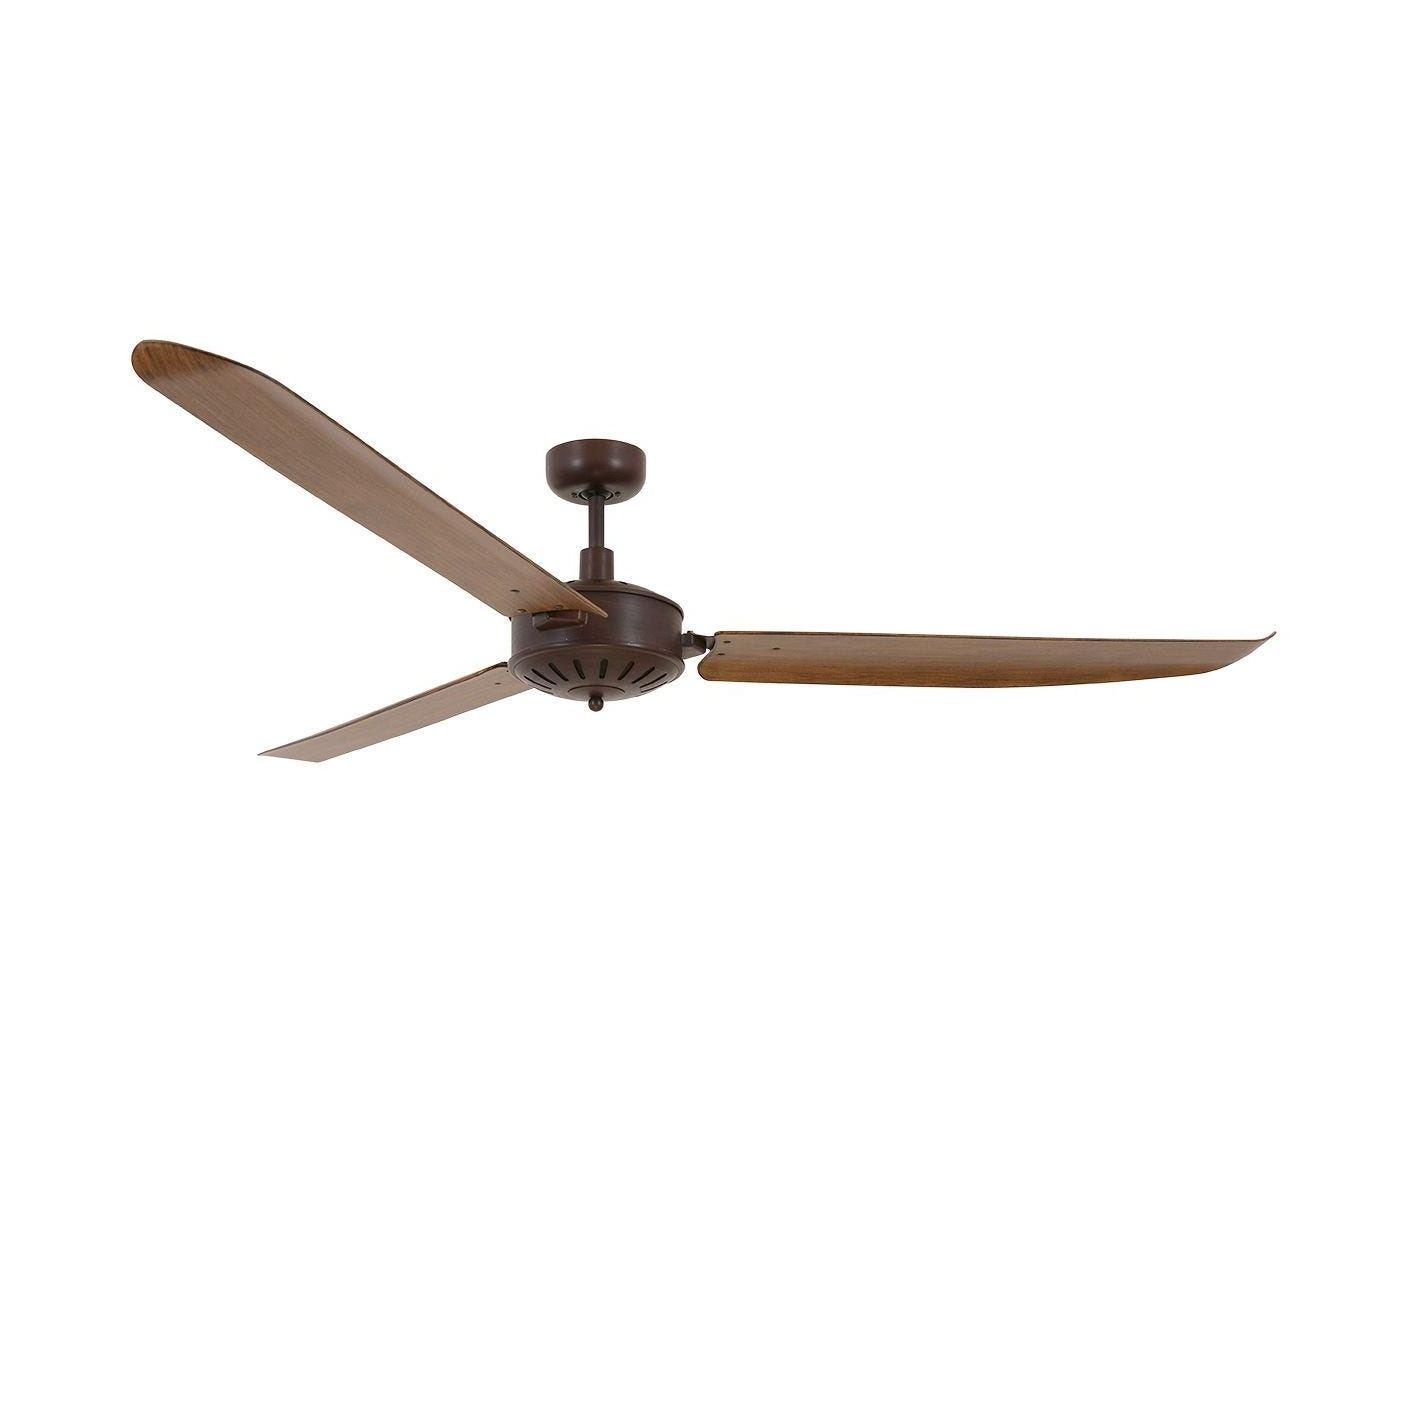 Stropný ventilátor Lucci Air Carolina 211022